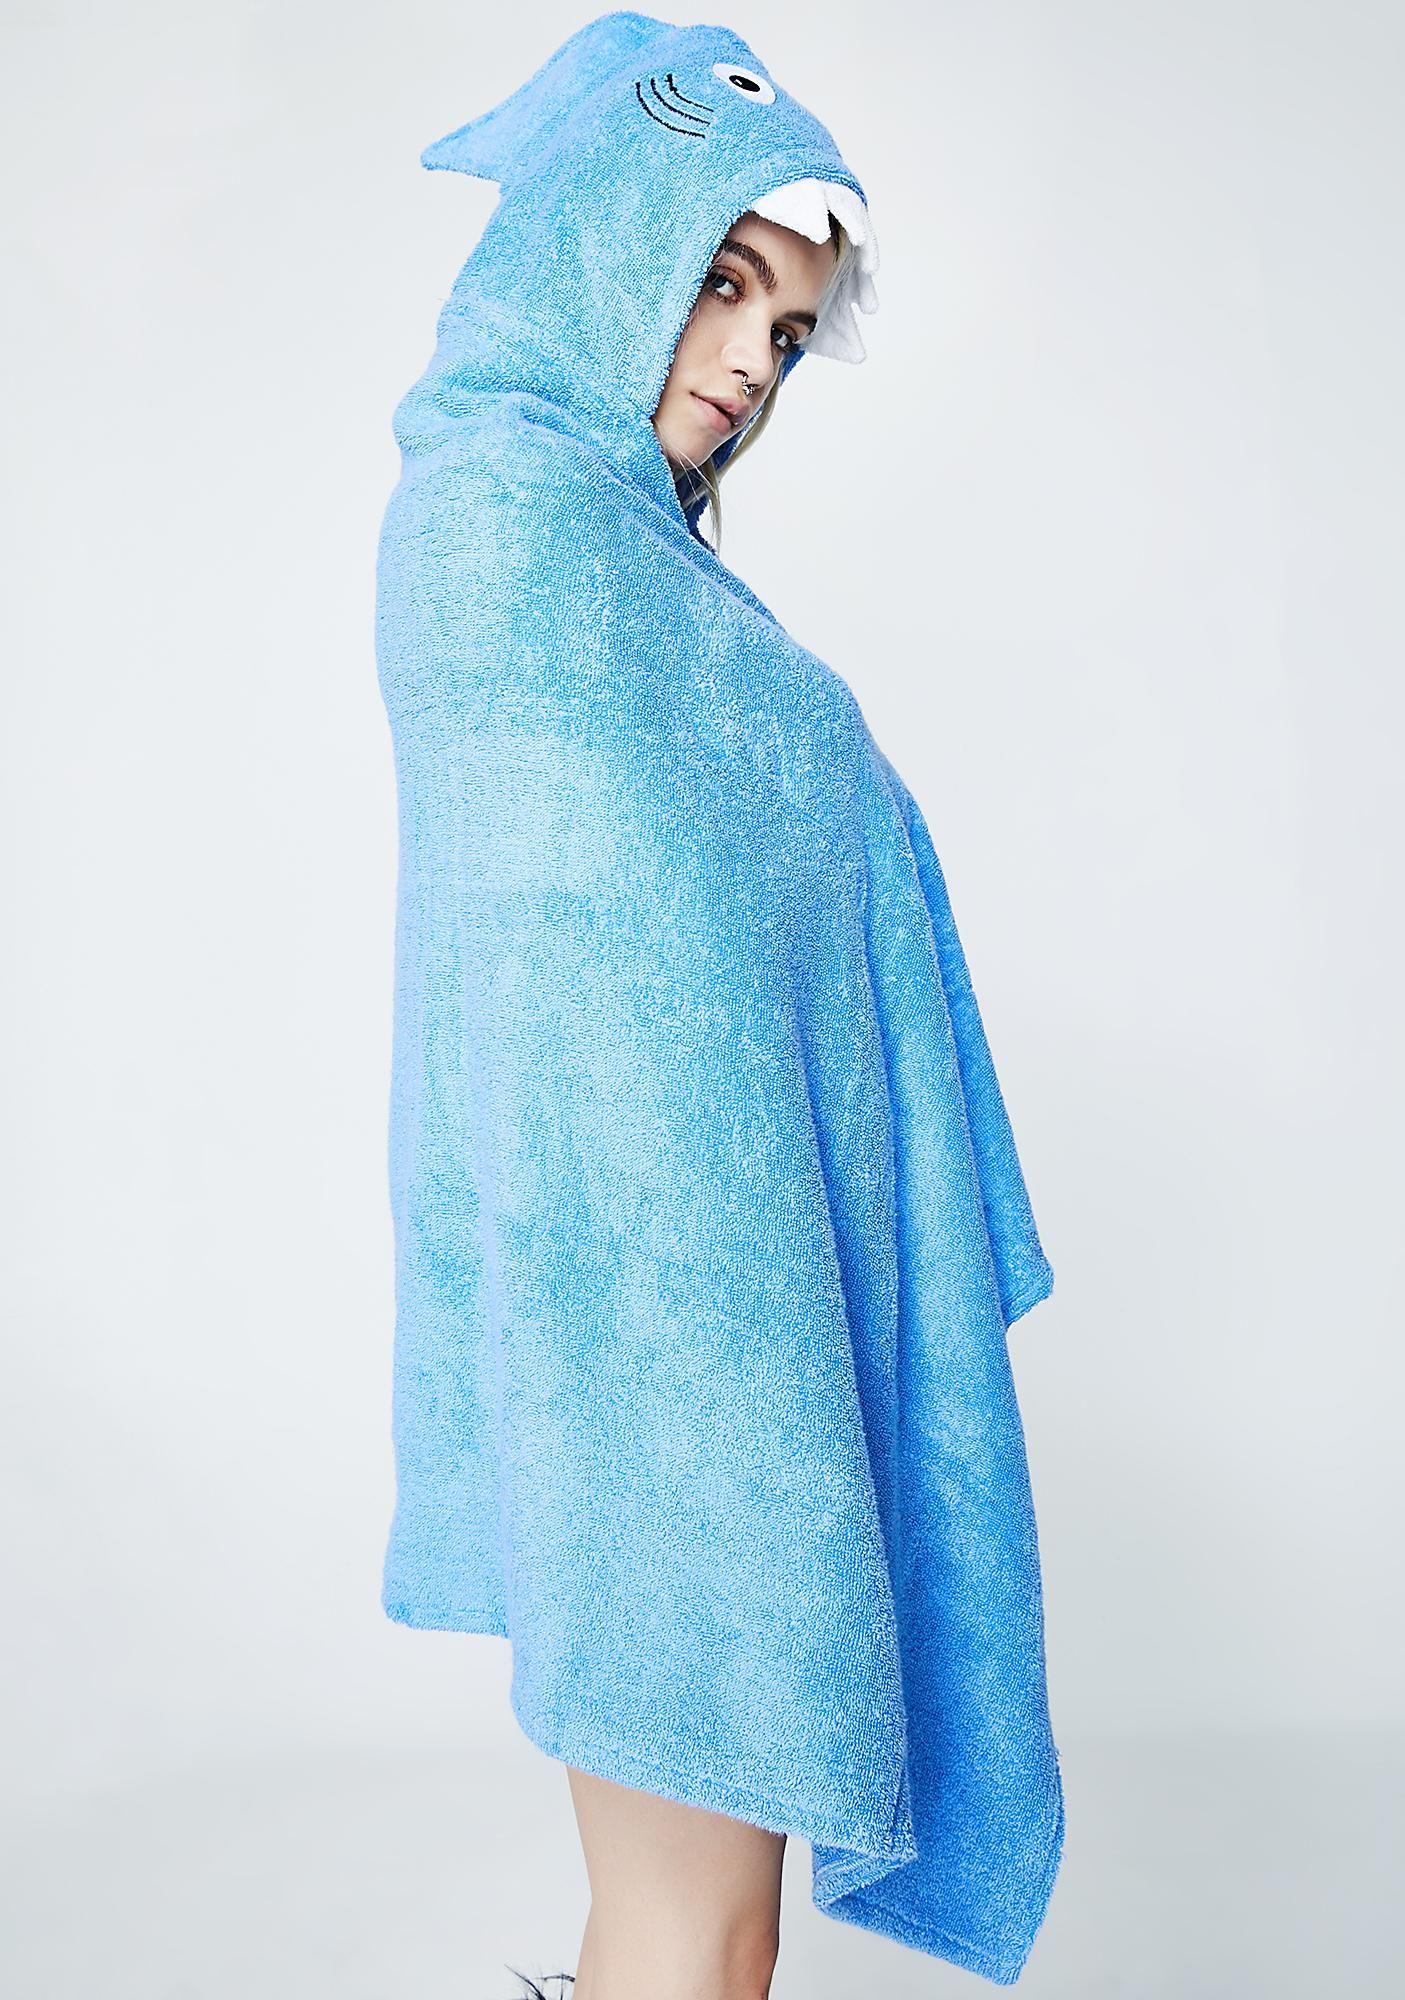 1ae345871d Adult Shark Hooded Towel | Gifts | Shark, Hoods, Towel